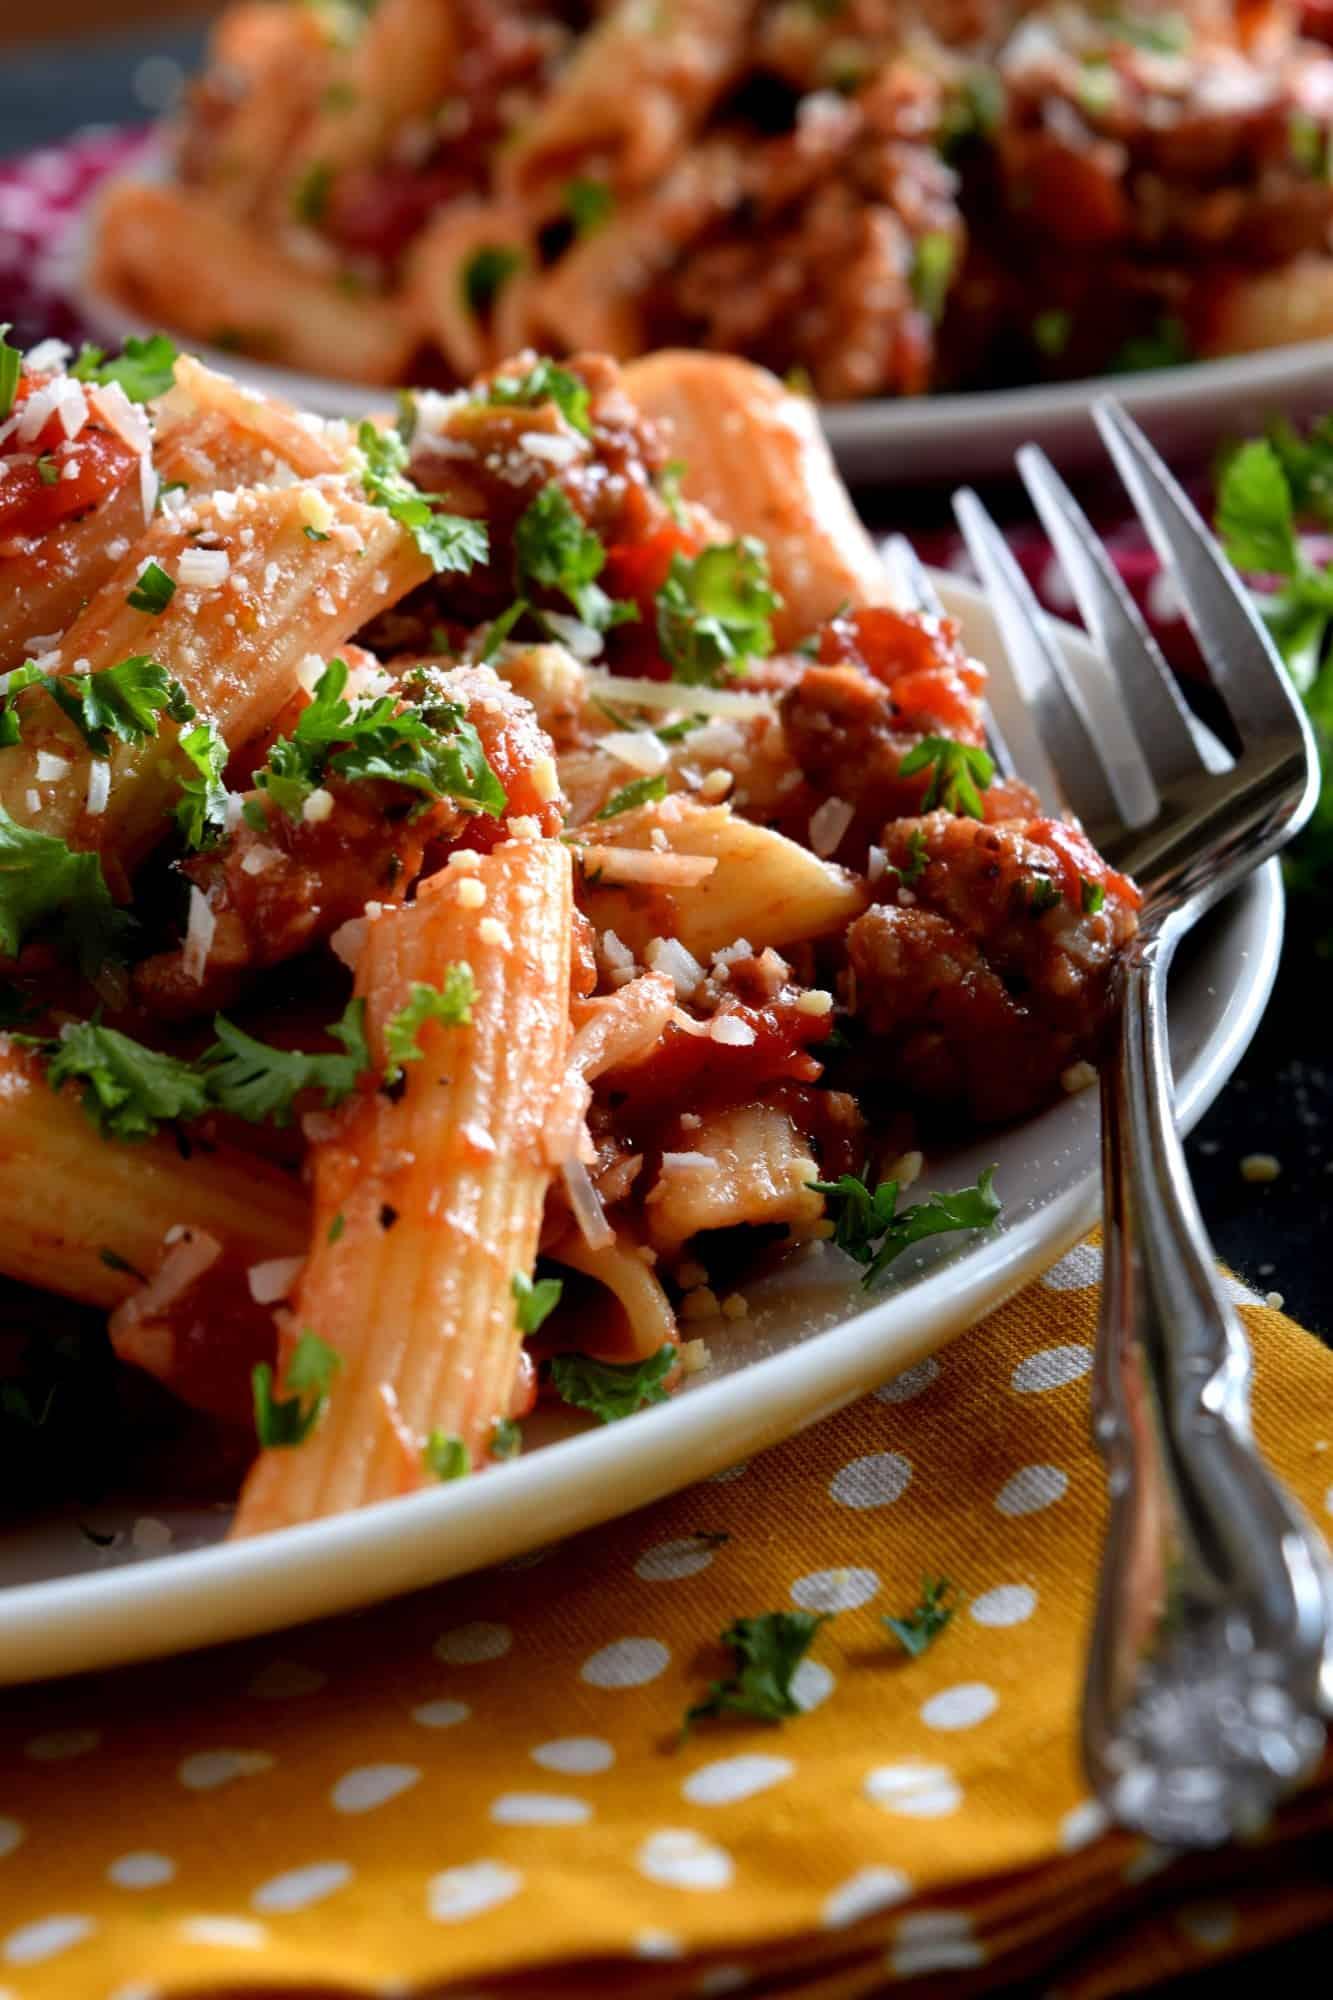 Spicy Shrimp Pasta {Creamy Spgahetti Recipe!} - WellPlated.com  |Spicy Italian Spaghetti